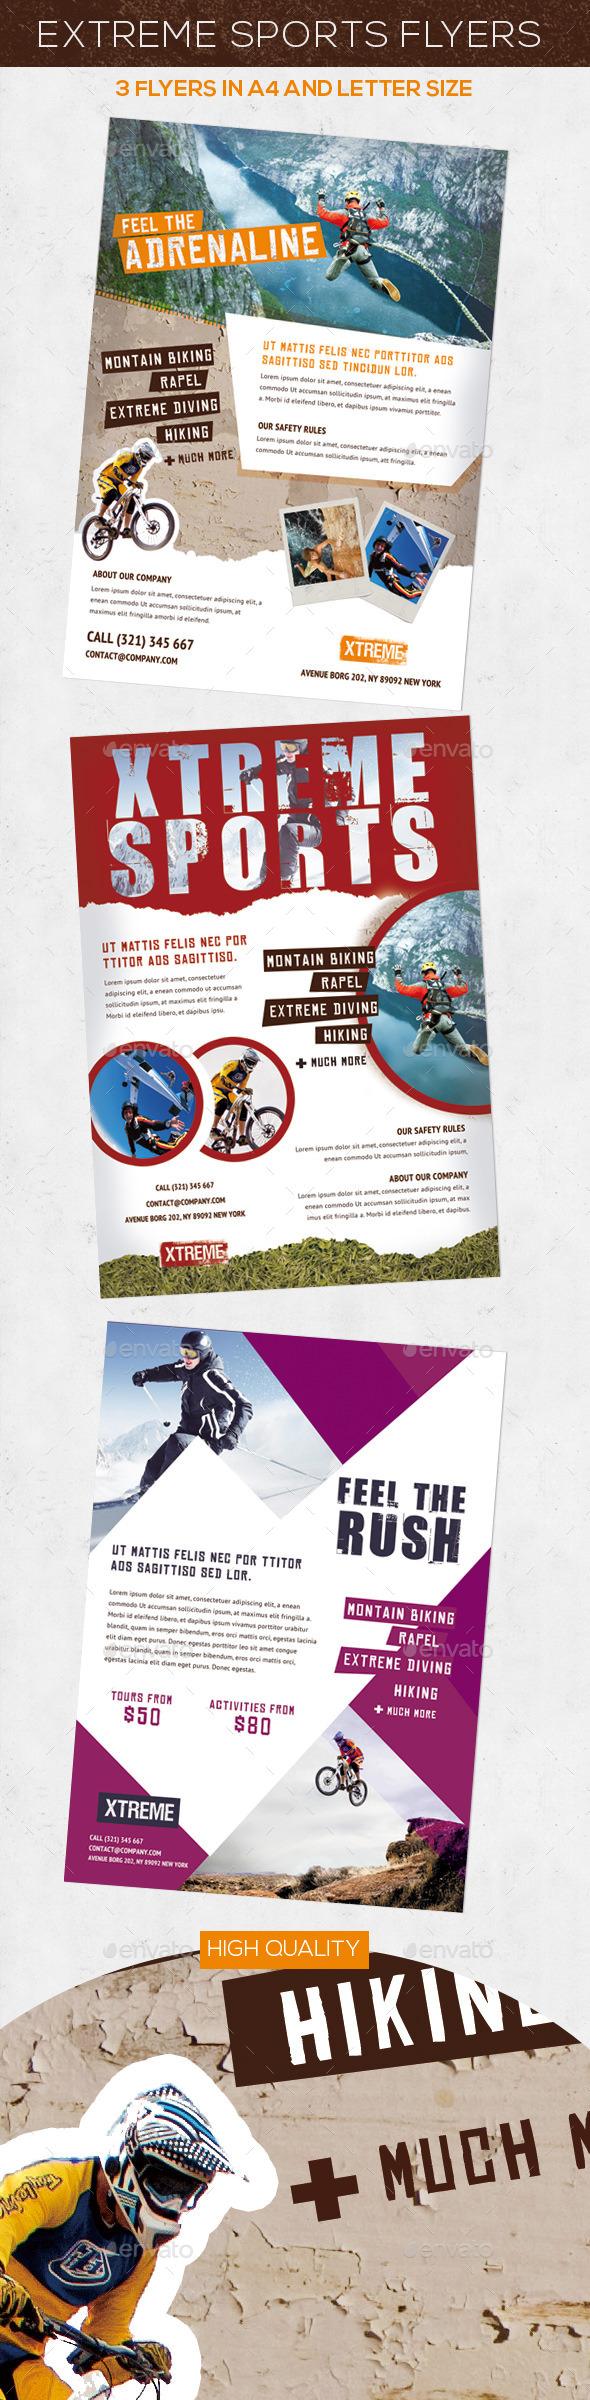 Extreme Sports Flyers / Magazine Ad